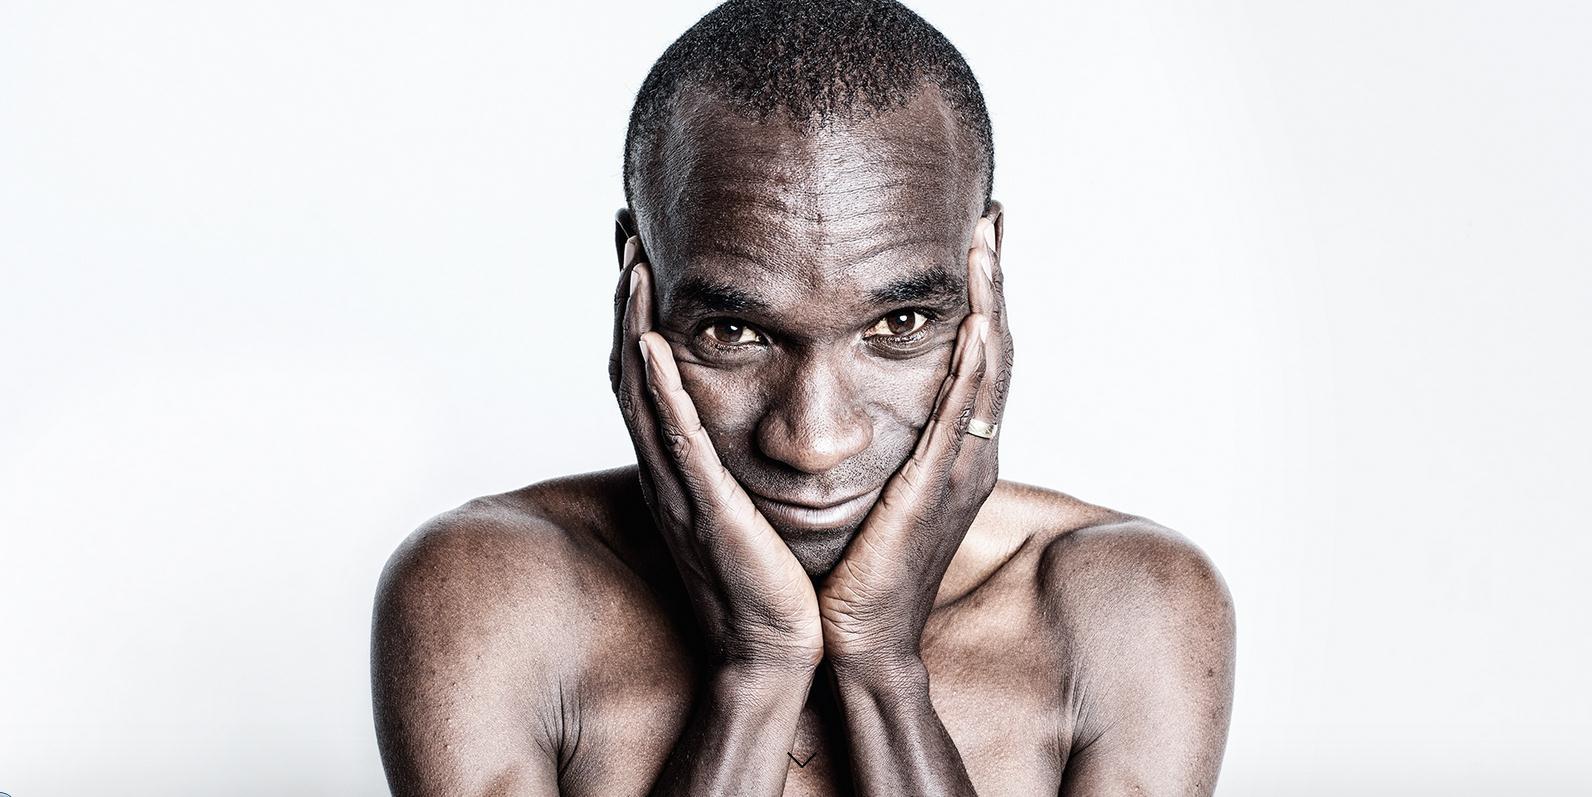 42,195 running maraton werunproject solidario libro